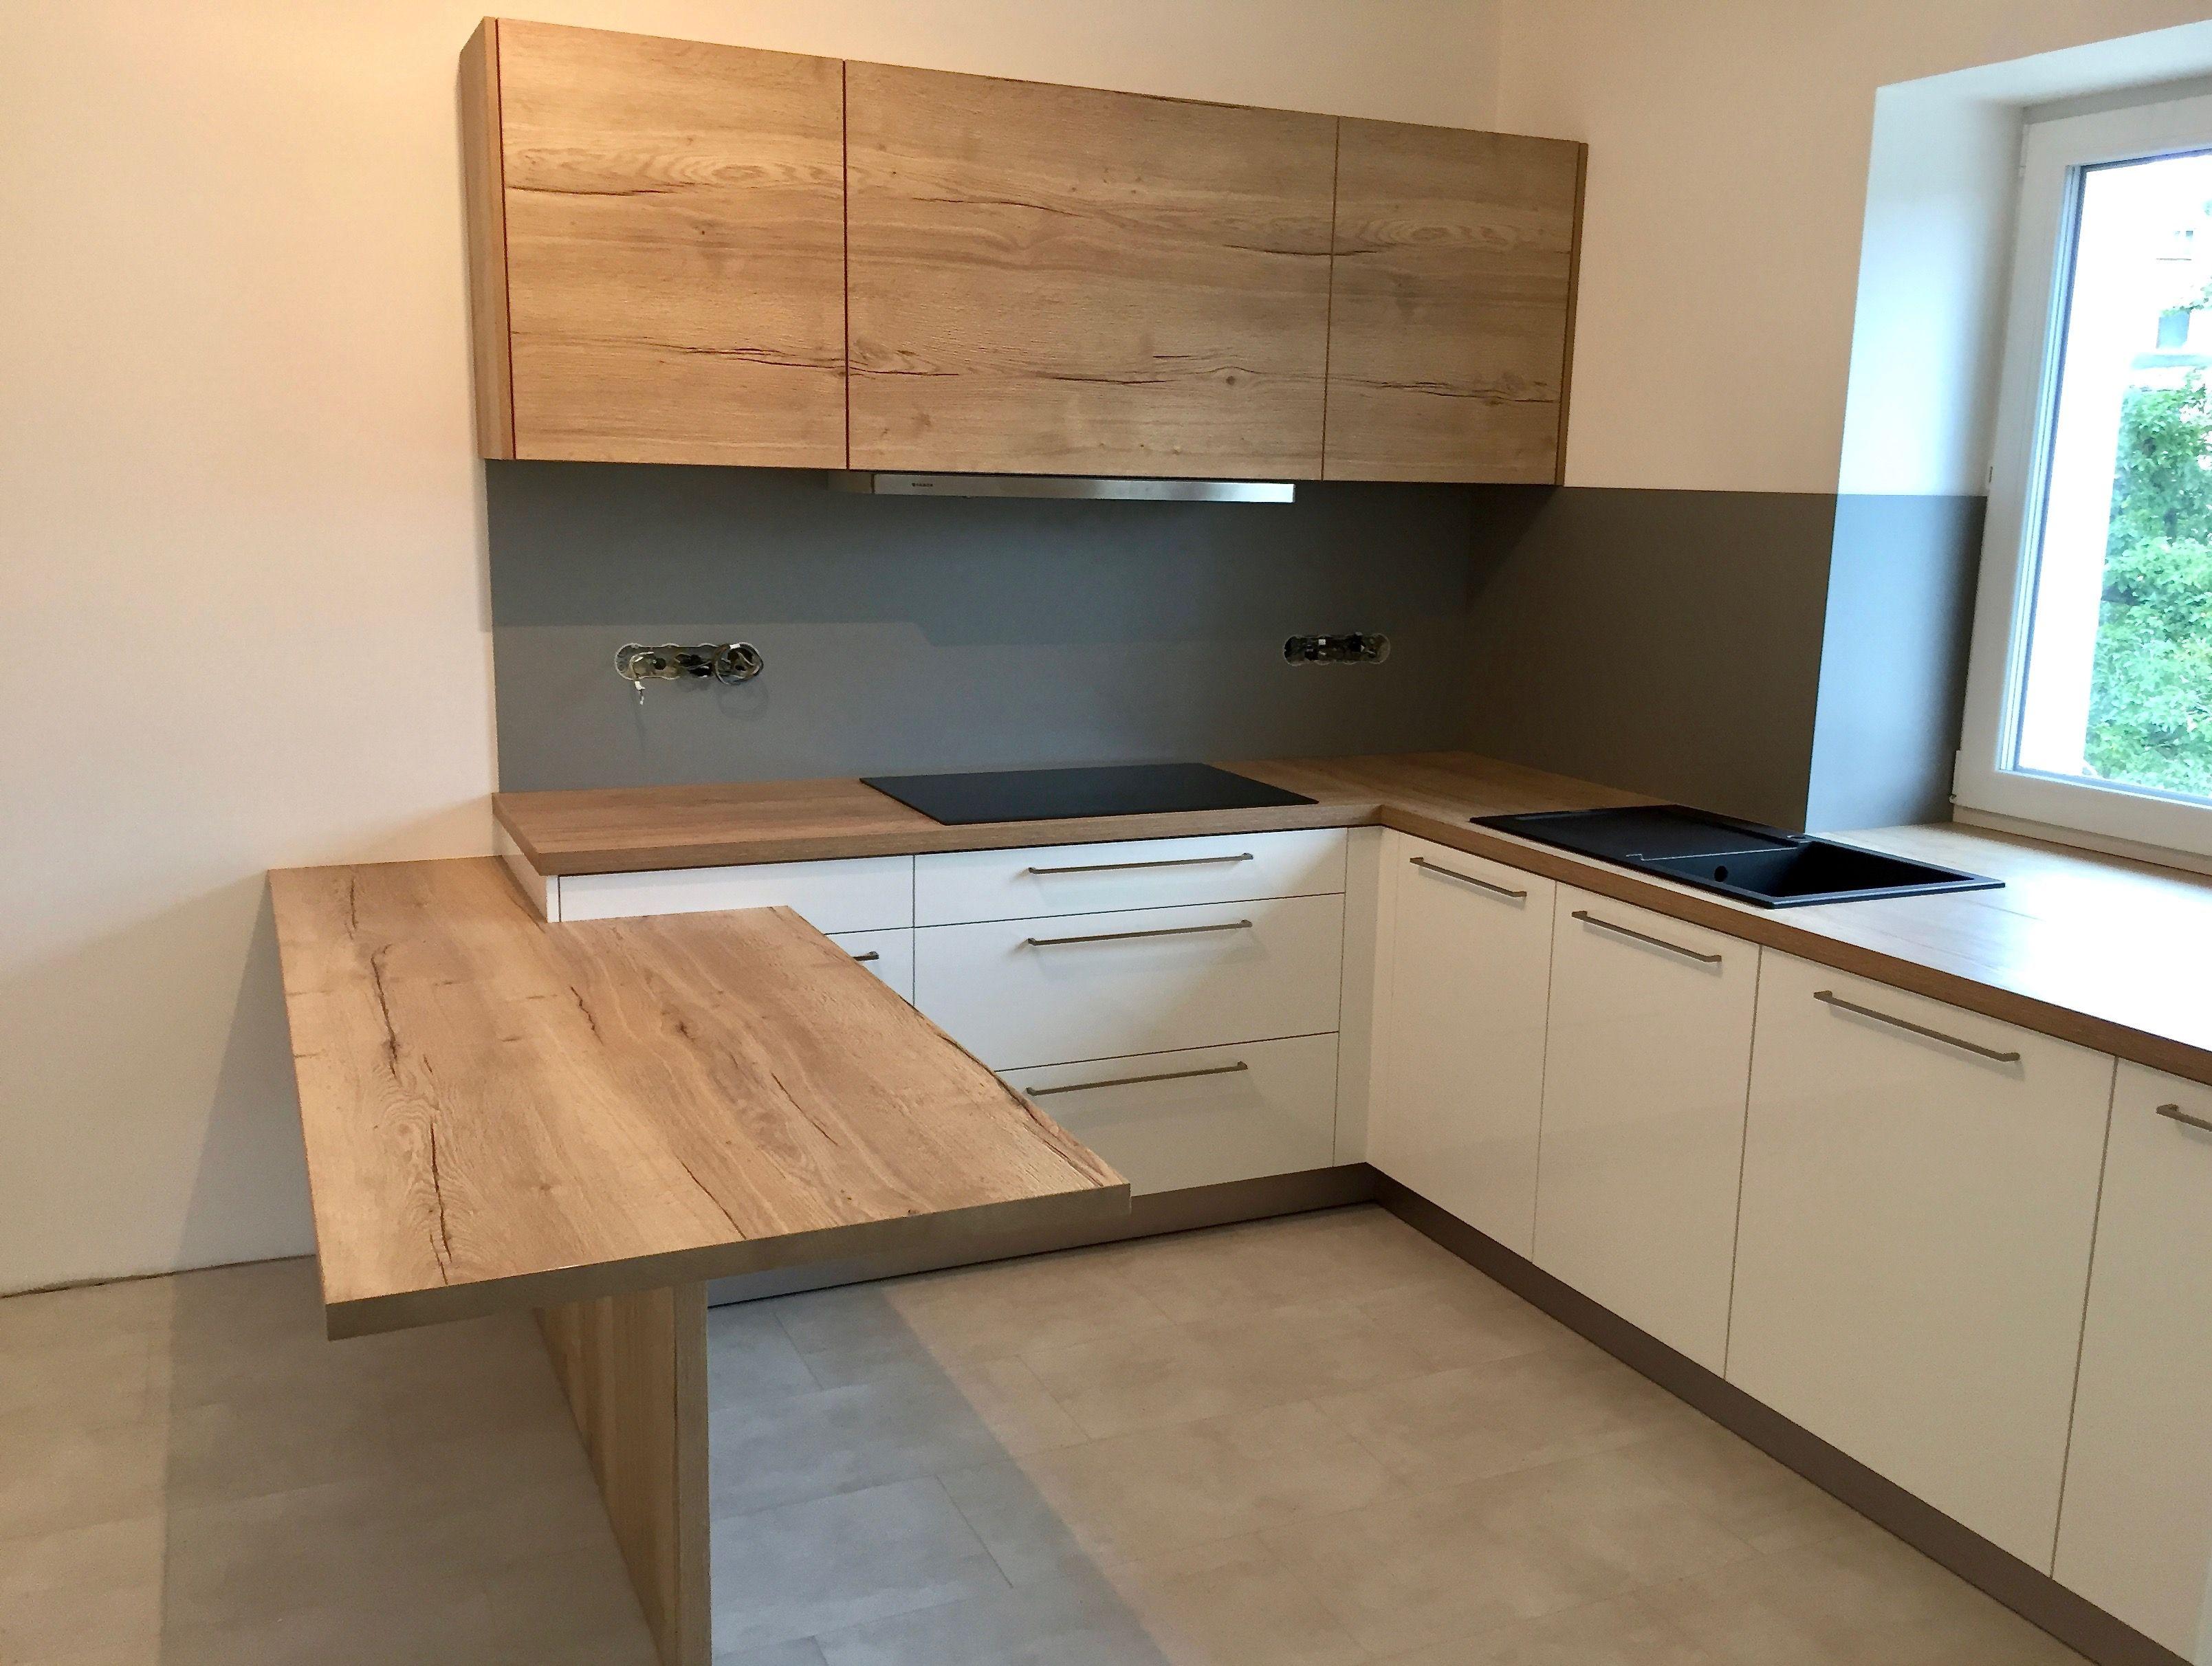 Dub halifax h1180 b l lesk v roba kuchyn modern for Kitchen design halifax